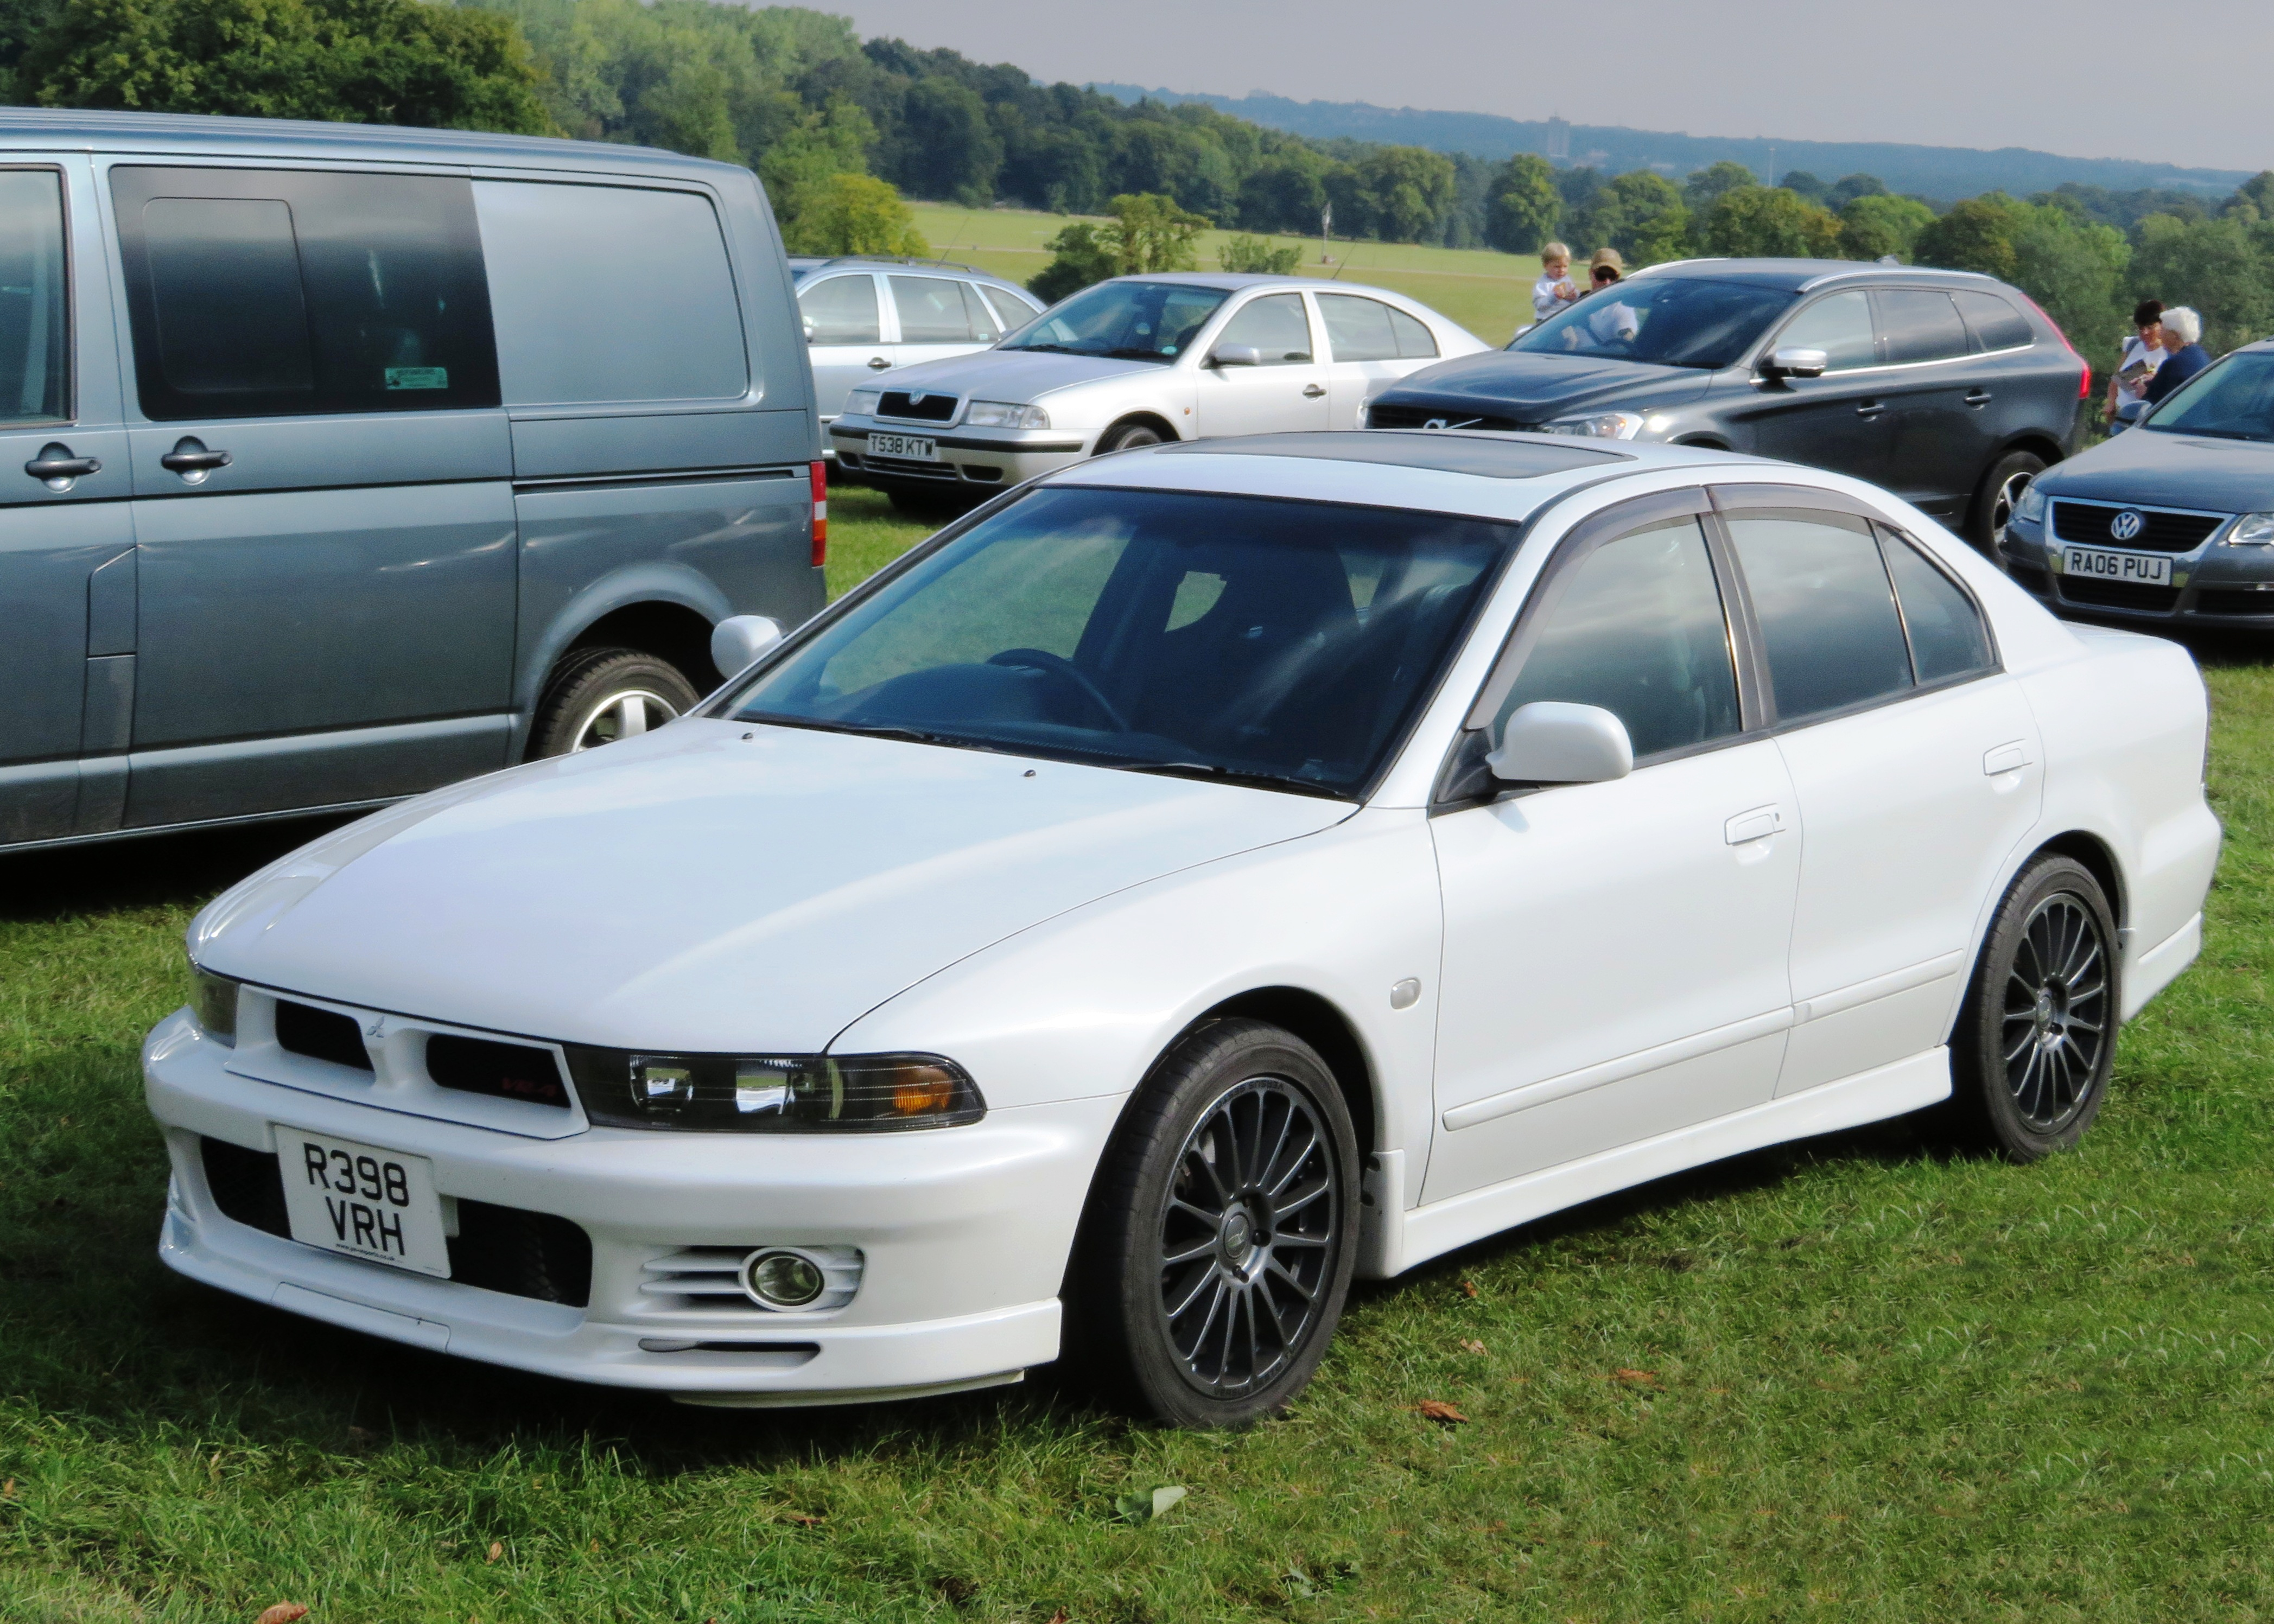 Mitsubishi Galant 2015 >> File Mitsubishi Galant Vr 4 Mfd 1998 But Registered Uk March